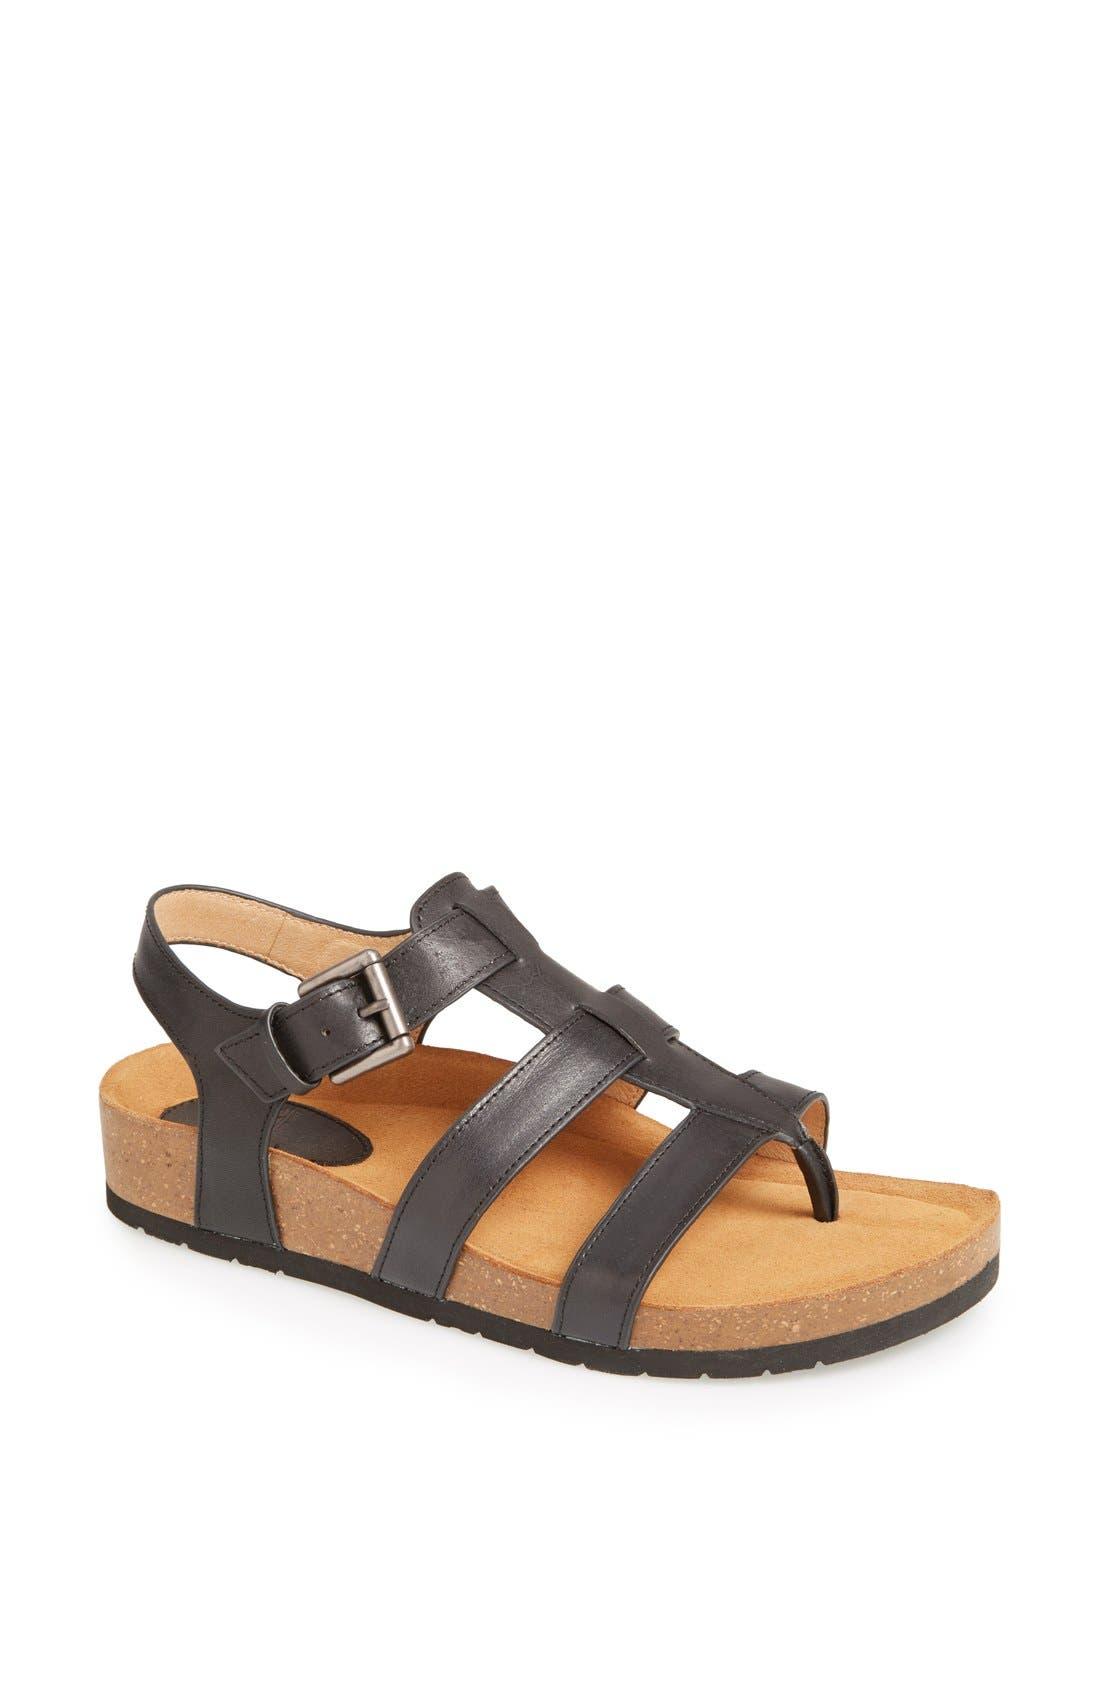 Main Image - Söfft 'Burdette' Leather Sandal